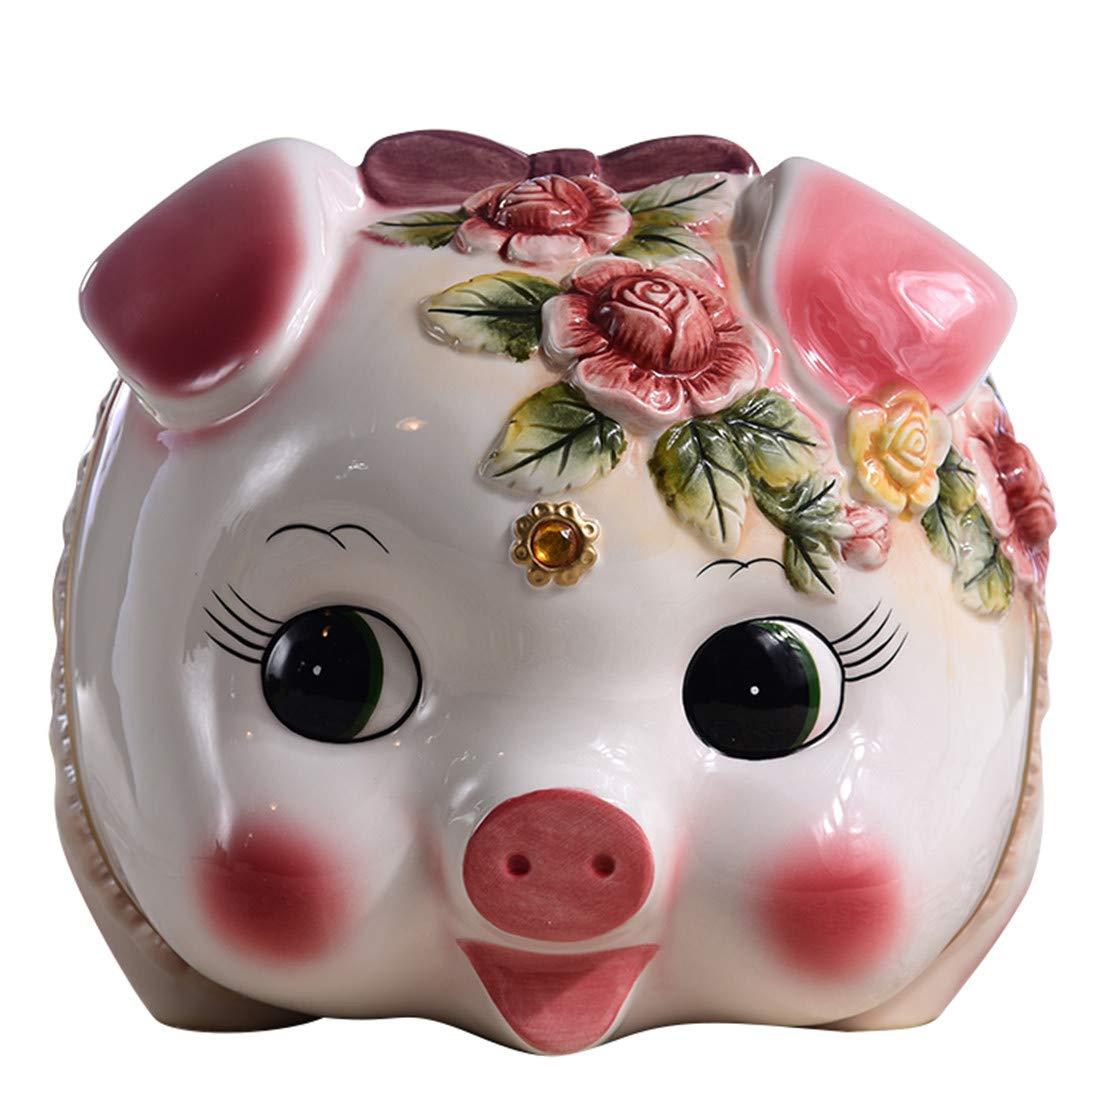 FORLONG FL2032 10'' L Large Piggy Bank Flower Pig Ceramic Coin Bank for Girls